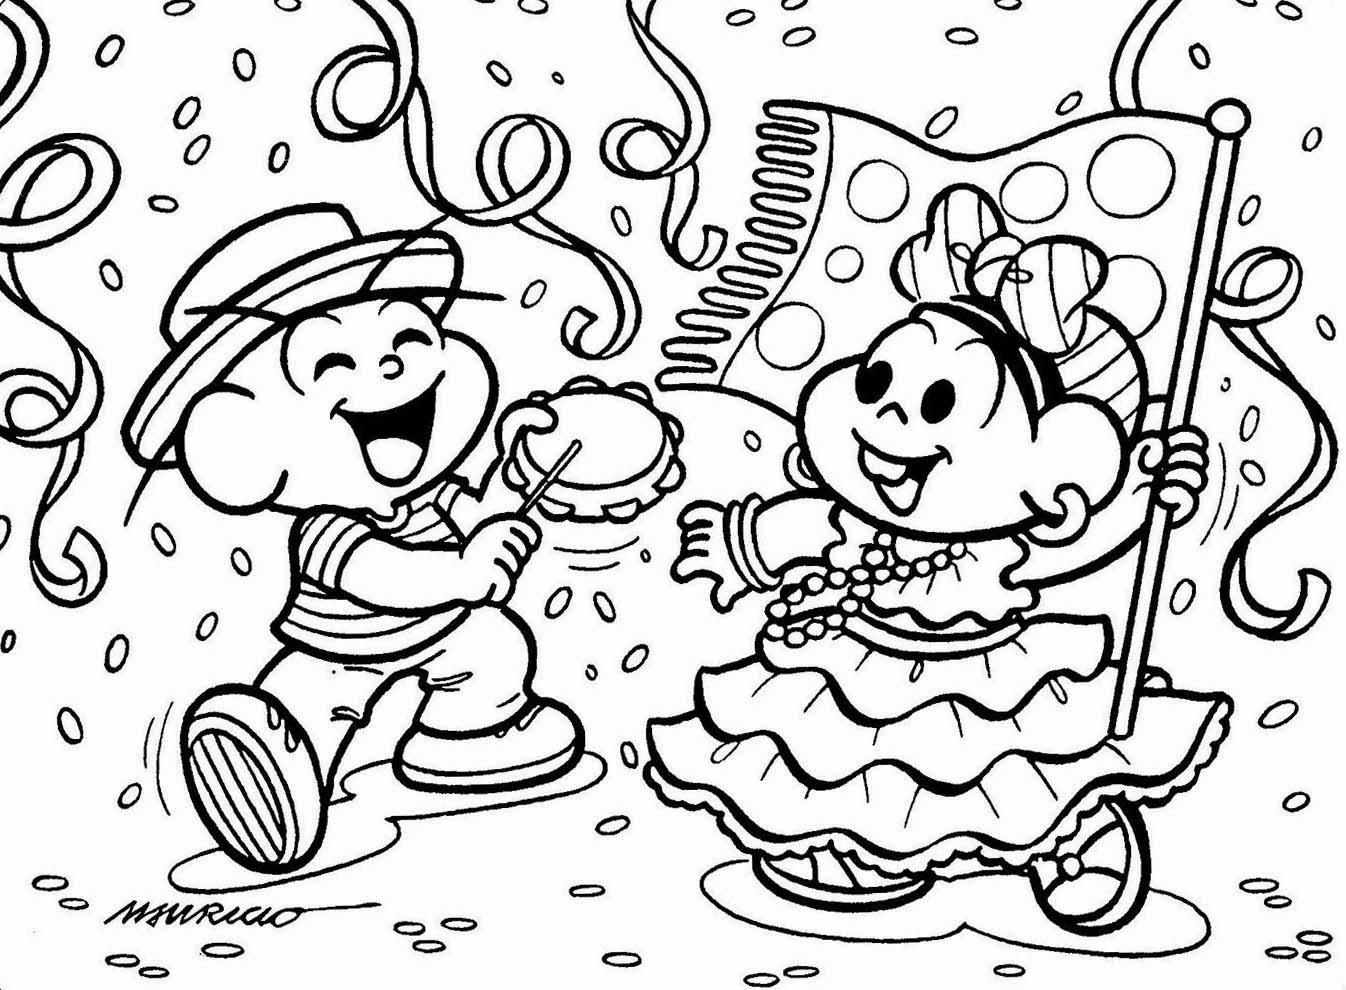 Desenhos Turma da Mônica Colorir Carnaval